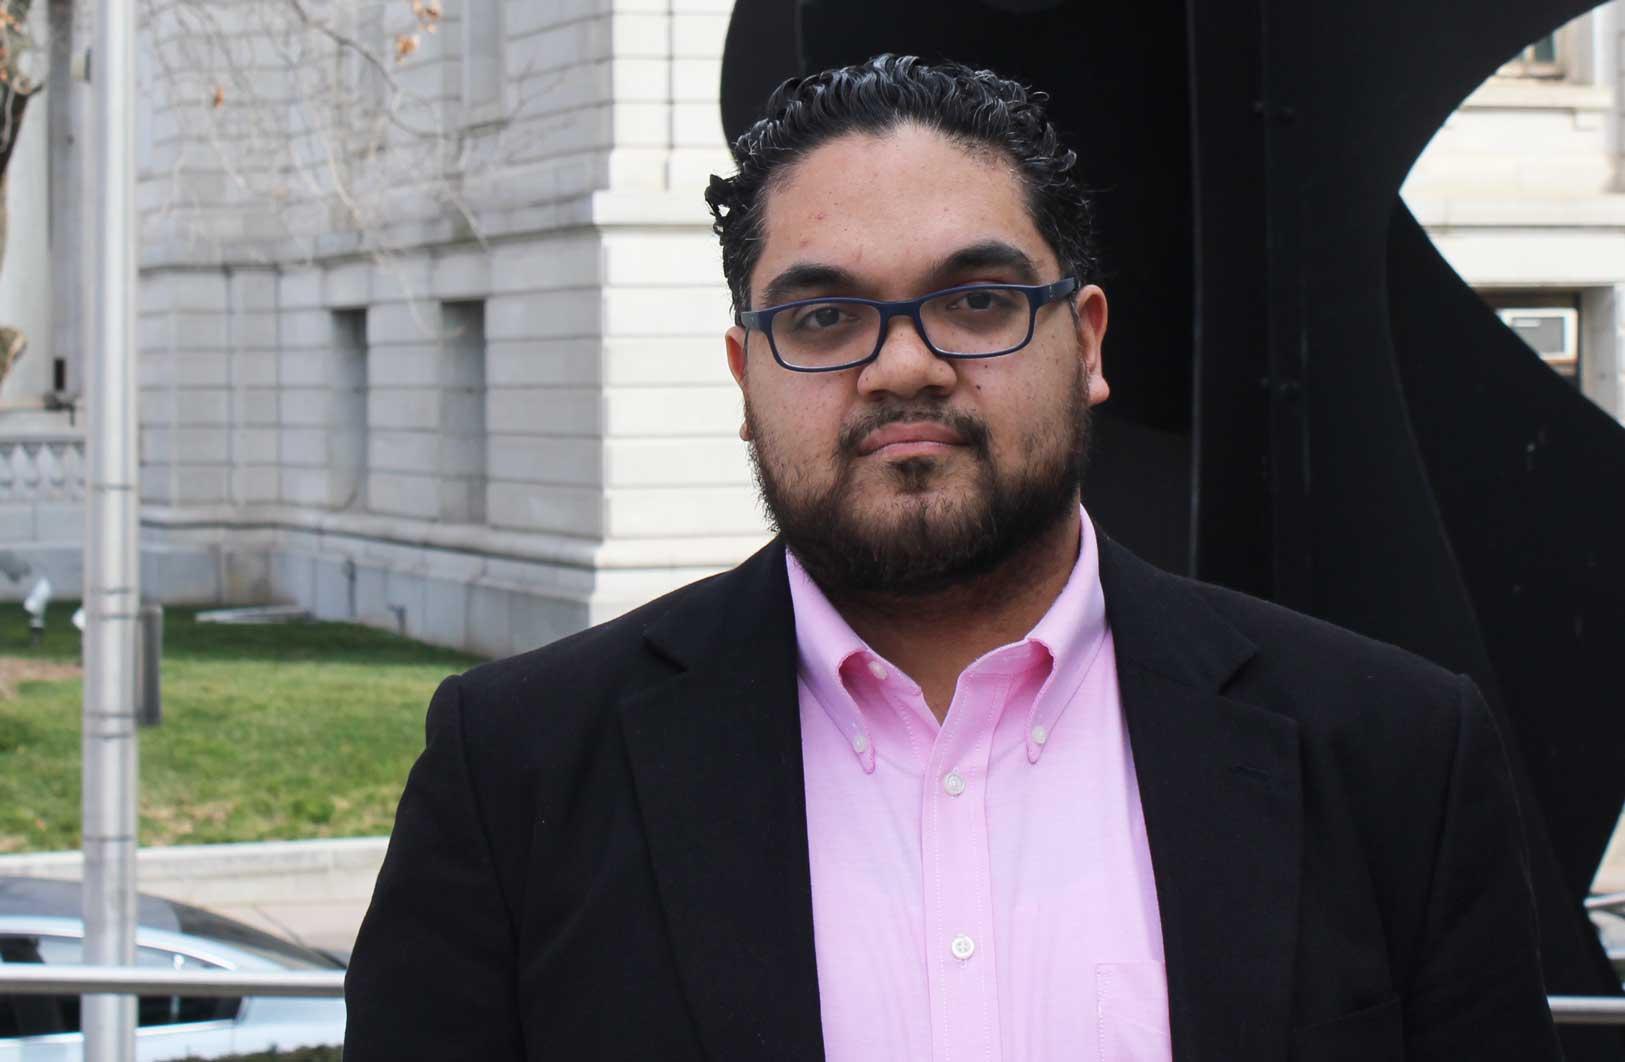 Our Newest Hartford Board Of Education Member Juan M Hernandez